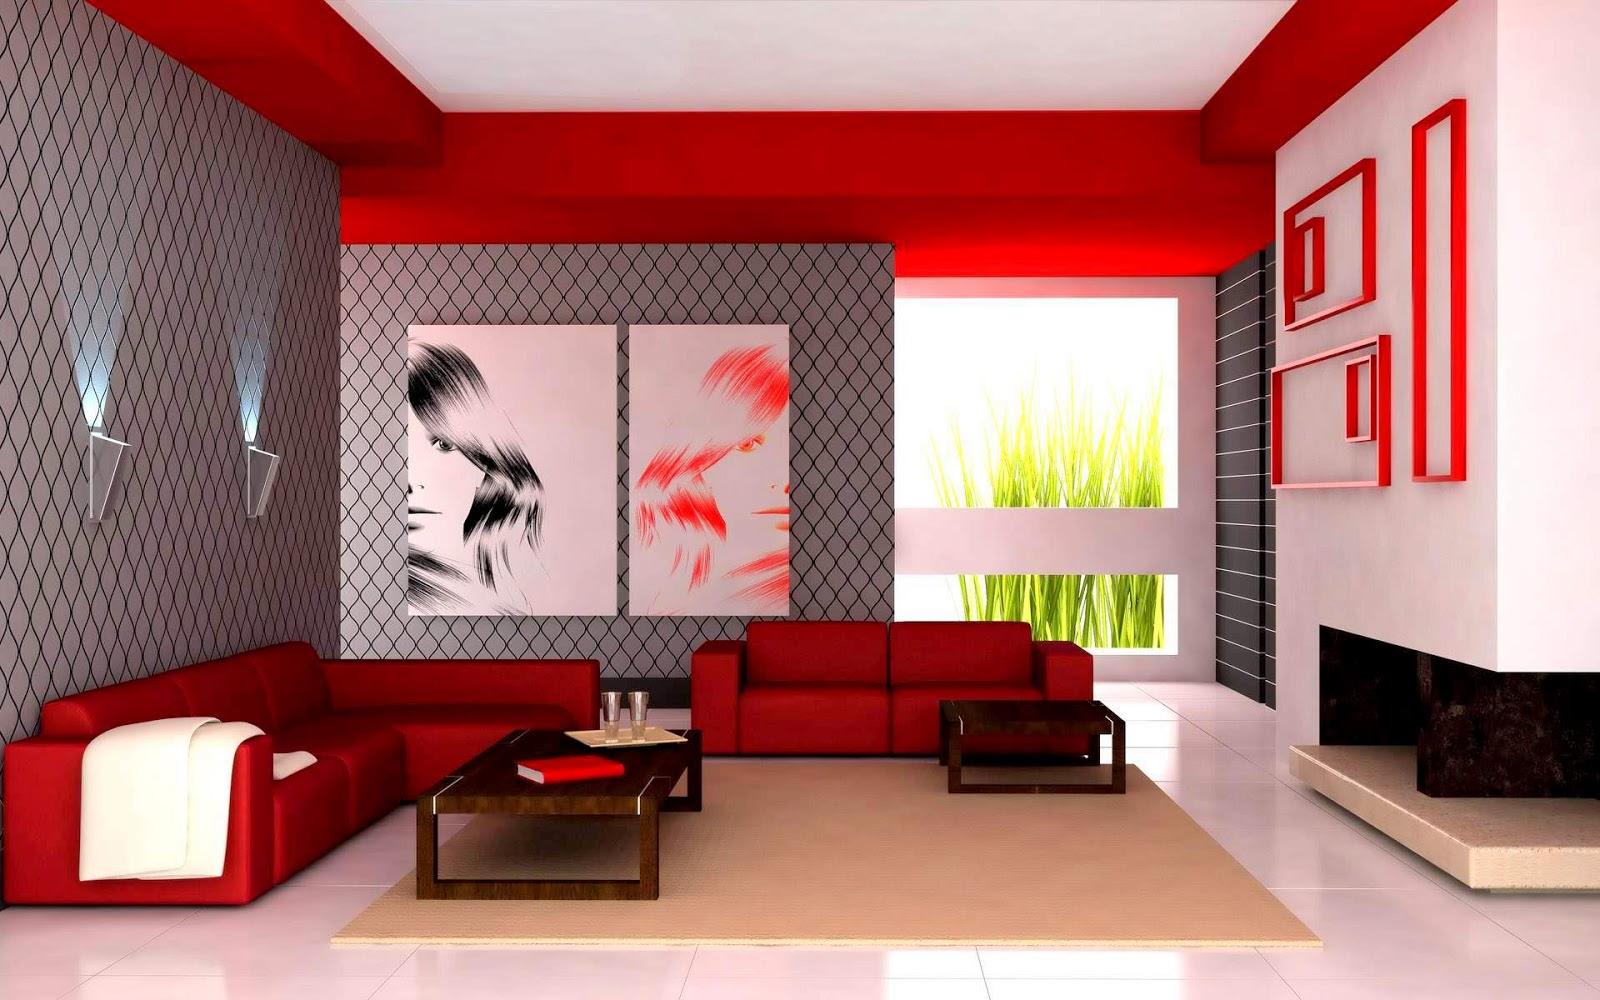 Idea Dekorasi Ruang Tamu Rumah Teres Setingkat A Moden Dengan Warna Merah Terang